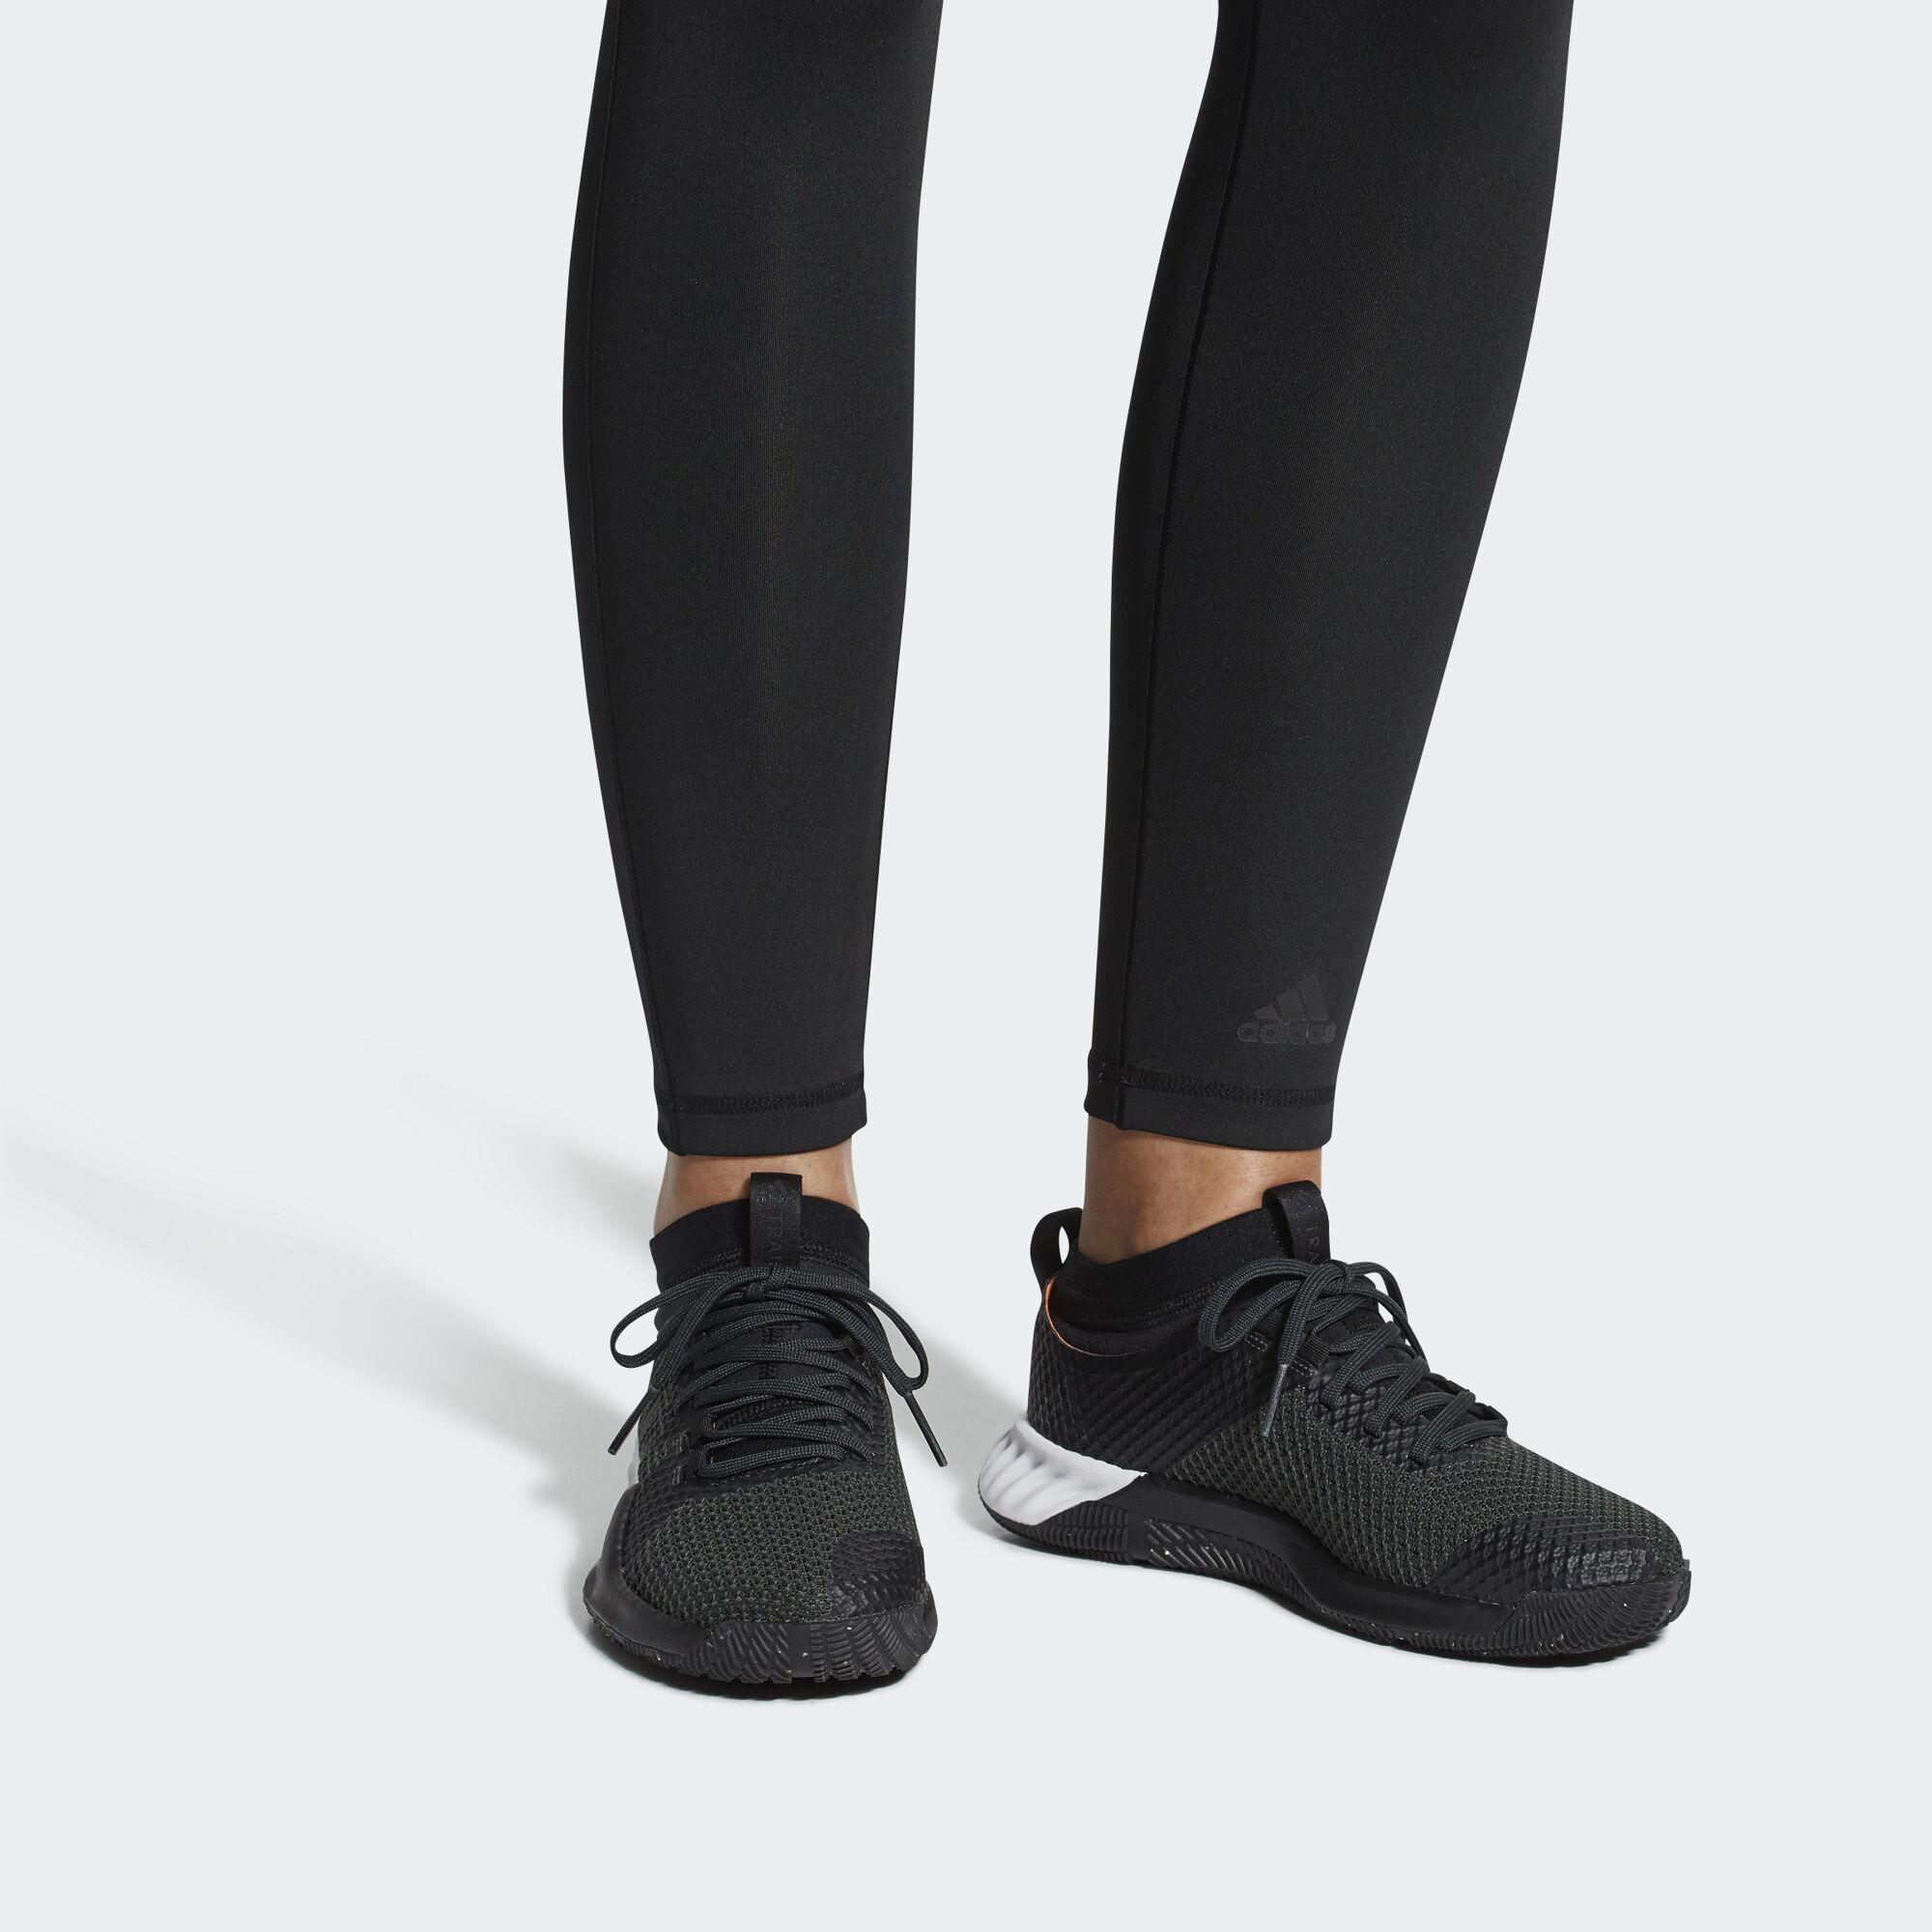 buy popular 395ab 3067f adidas CrazyTrain Pro 3.0 Shoes - Black  adidas Switzerland